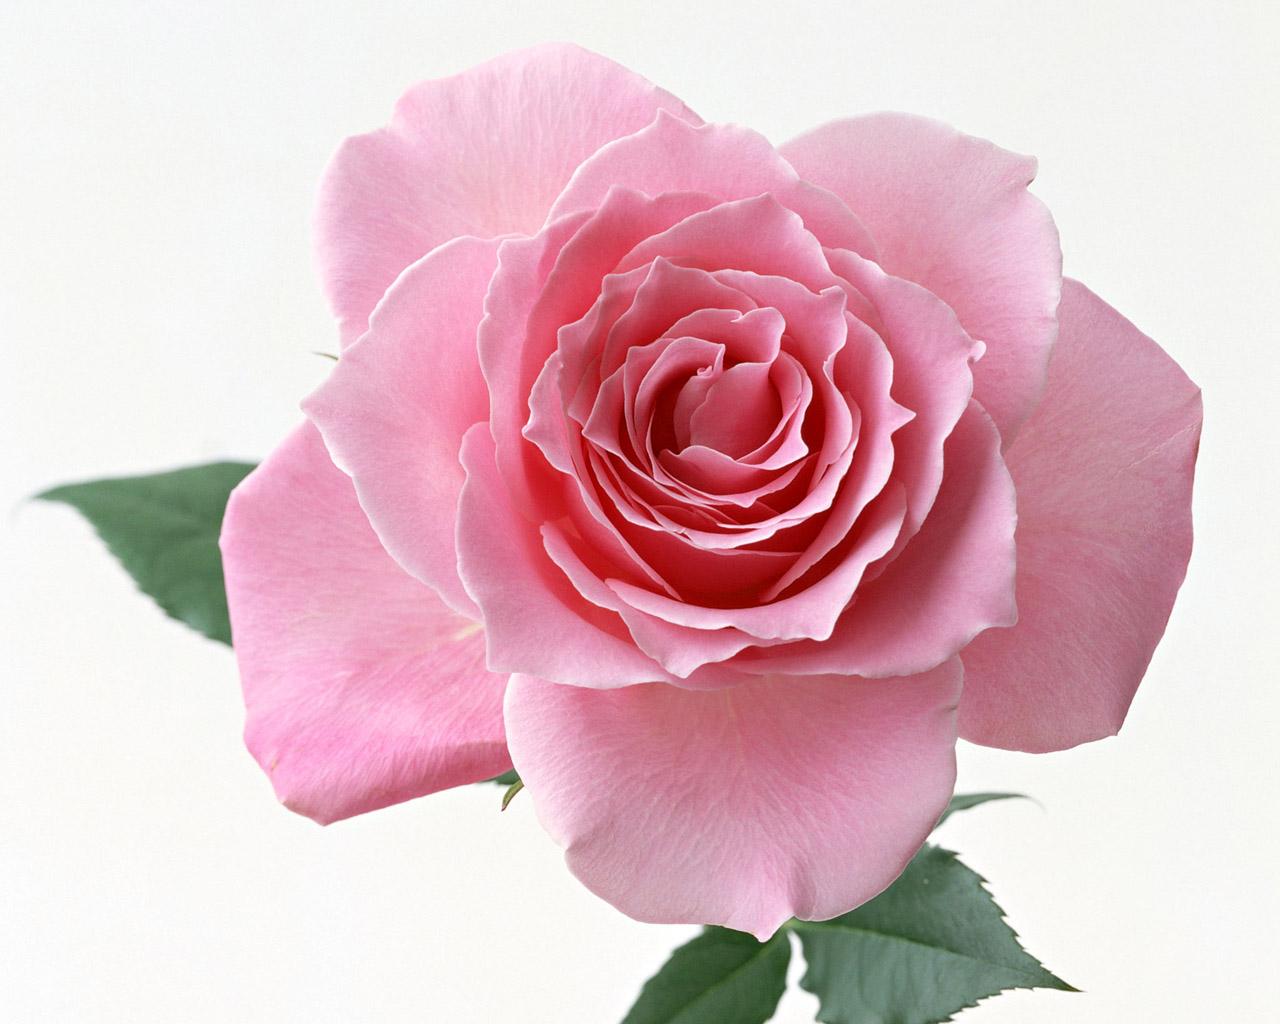 Pink Rose Desktop Wallpaper 123mobileWallpaperscom 1280x1024